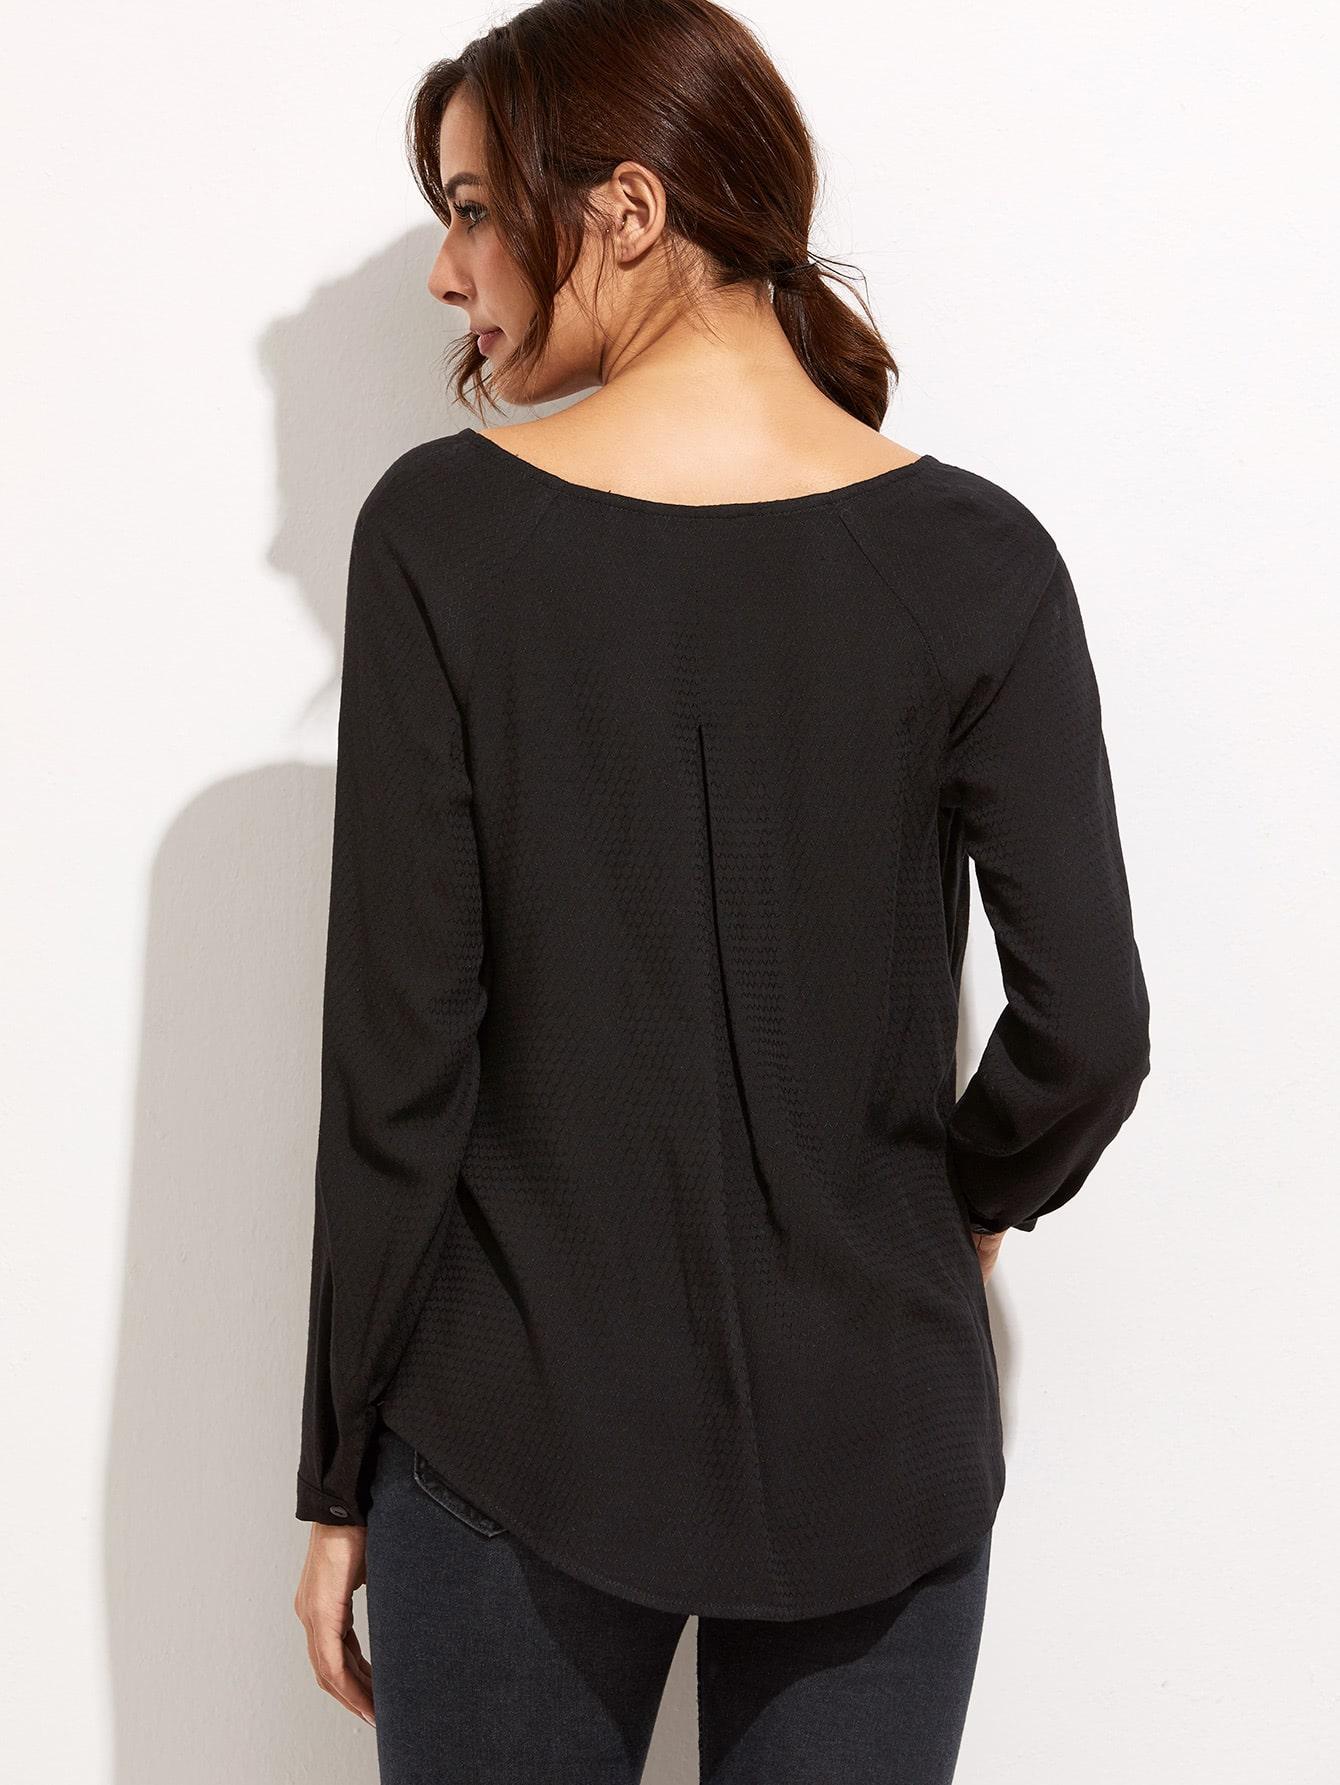 blouse141004705_2